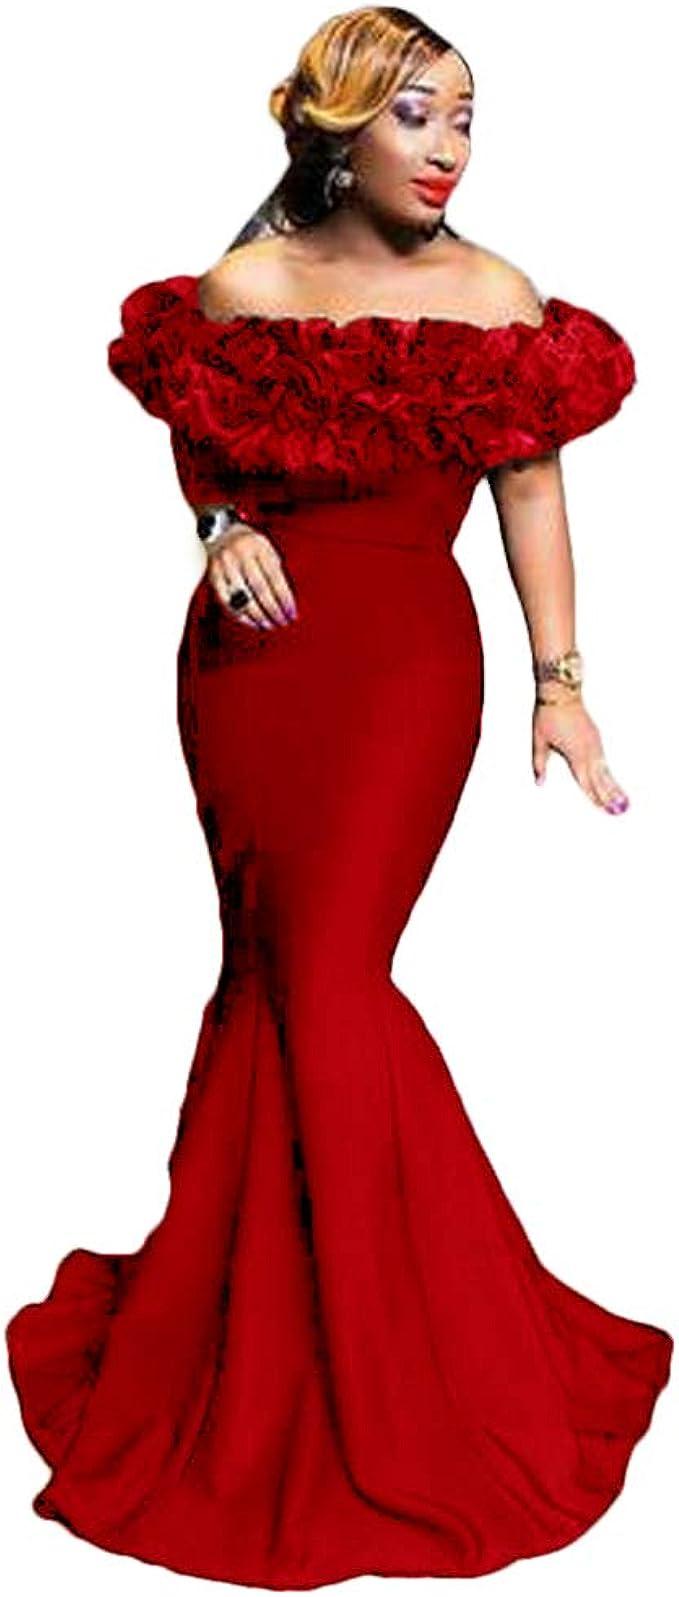 Hyc Abendkleid Afrikanische Meerjungfrau Lang Mit Ruschen Halsausschnitt Abschlussballkleid Reissverschluss Hinten Armellos Formelles Partykleid Rot 42 Amazon De Bekleidung